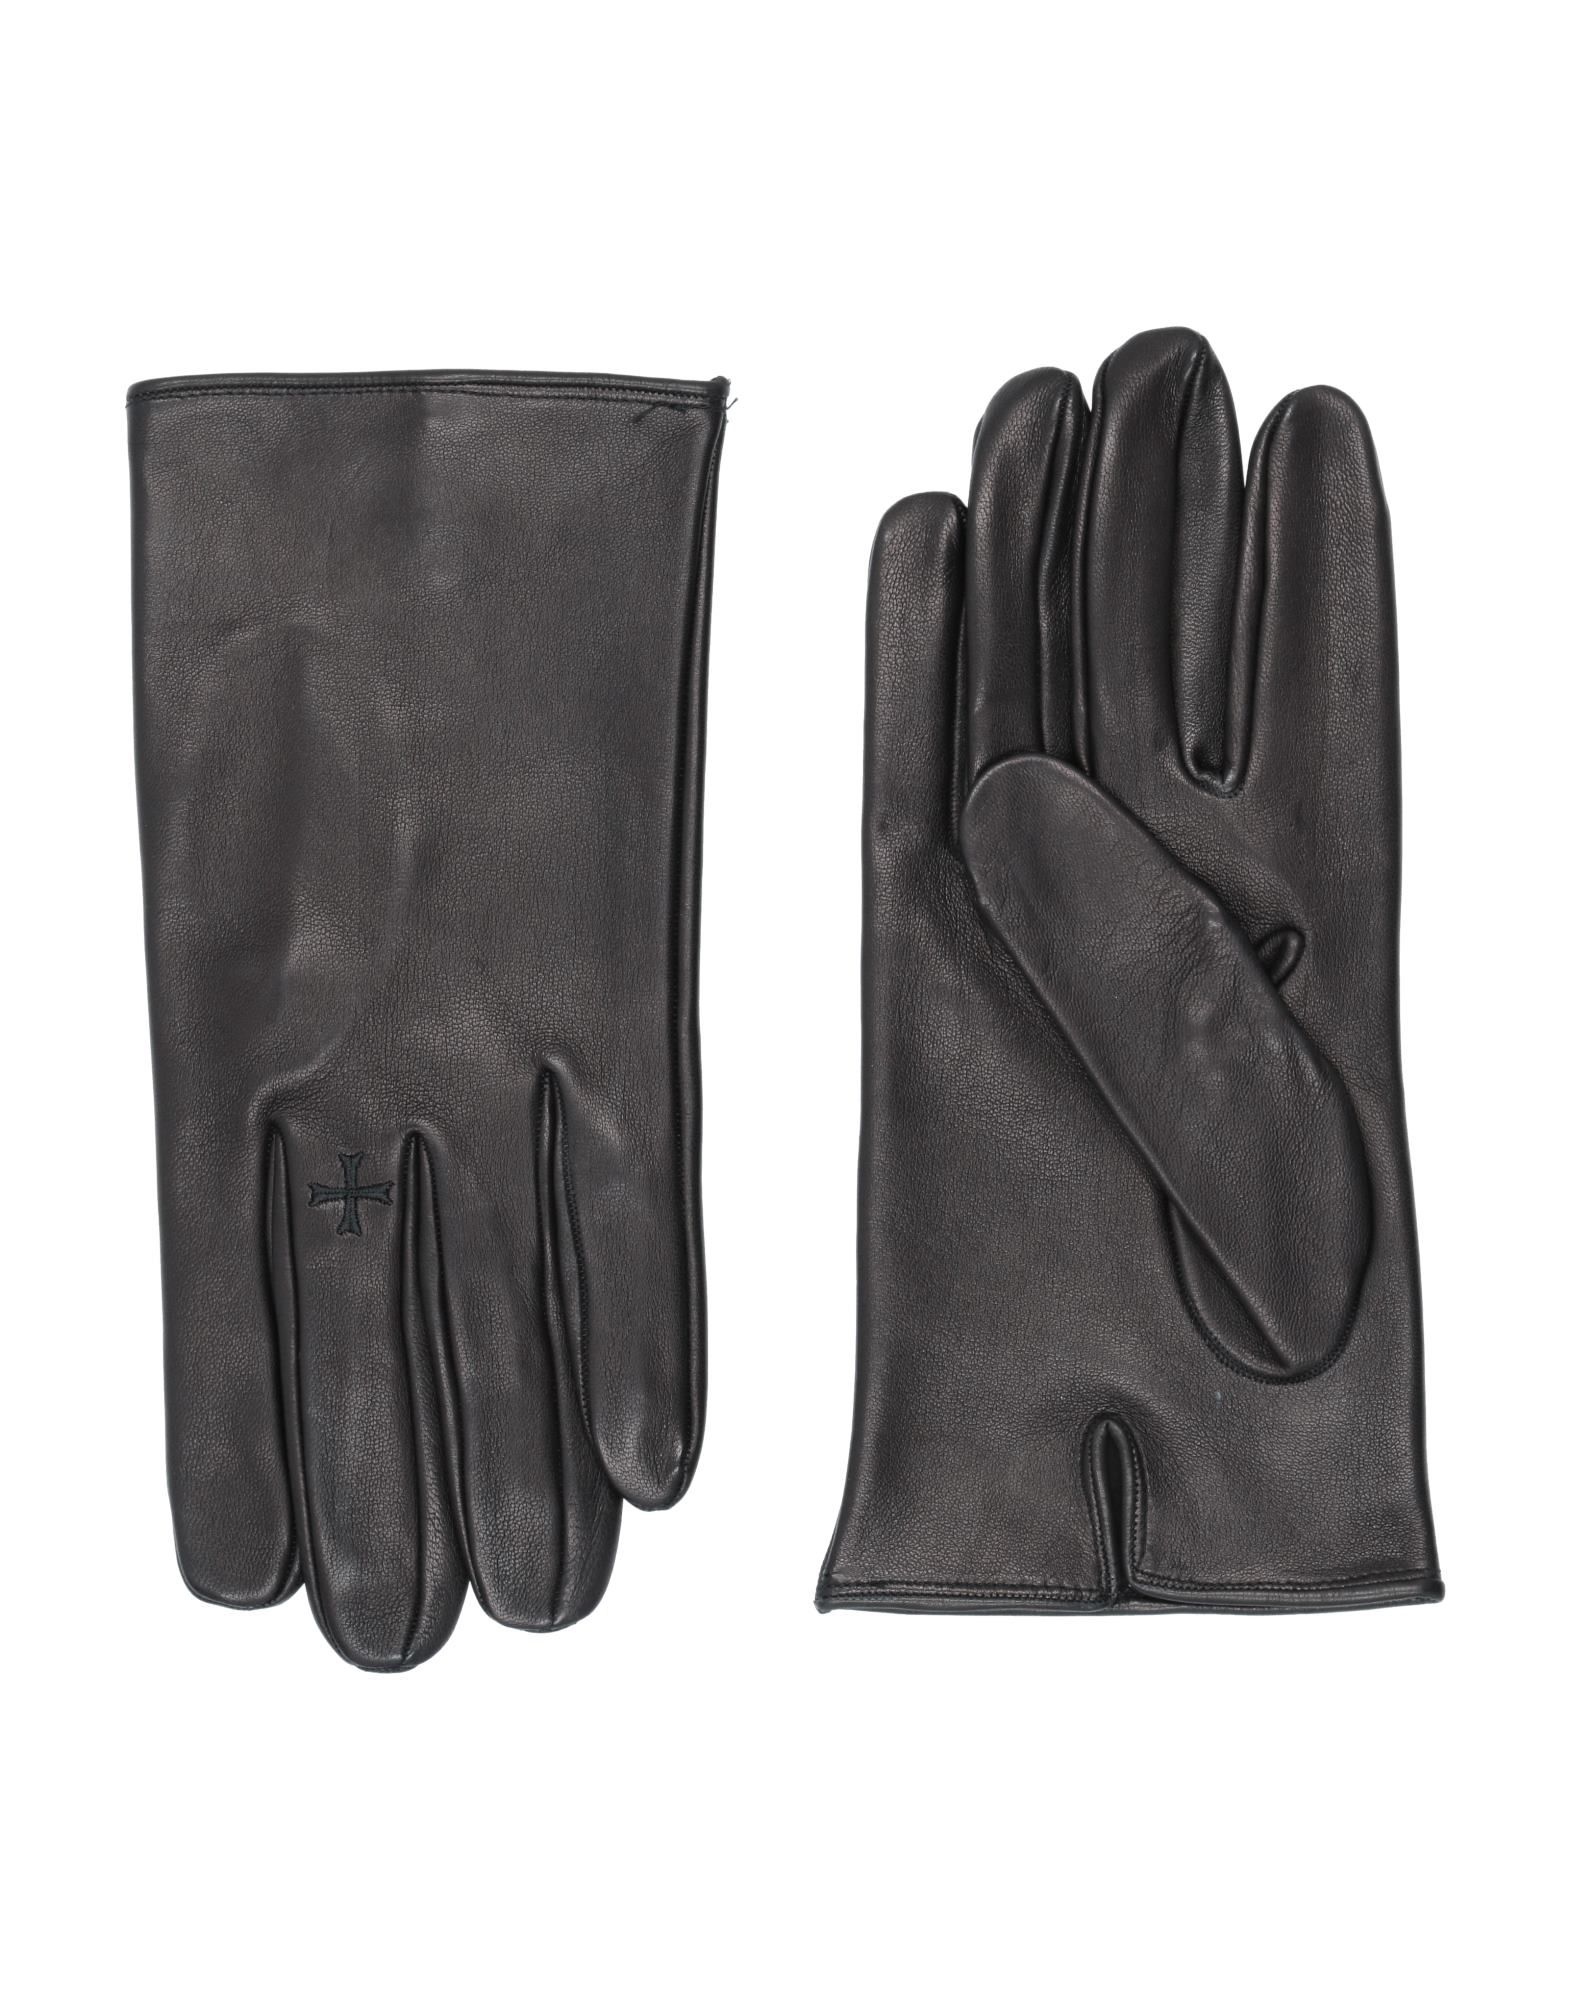 NEIL BARRETT Gloves. leather, no appliqués, basic solid color, contains non-textile parts of animal origin. Soft Leather